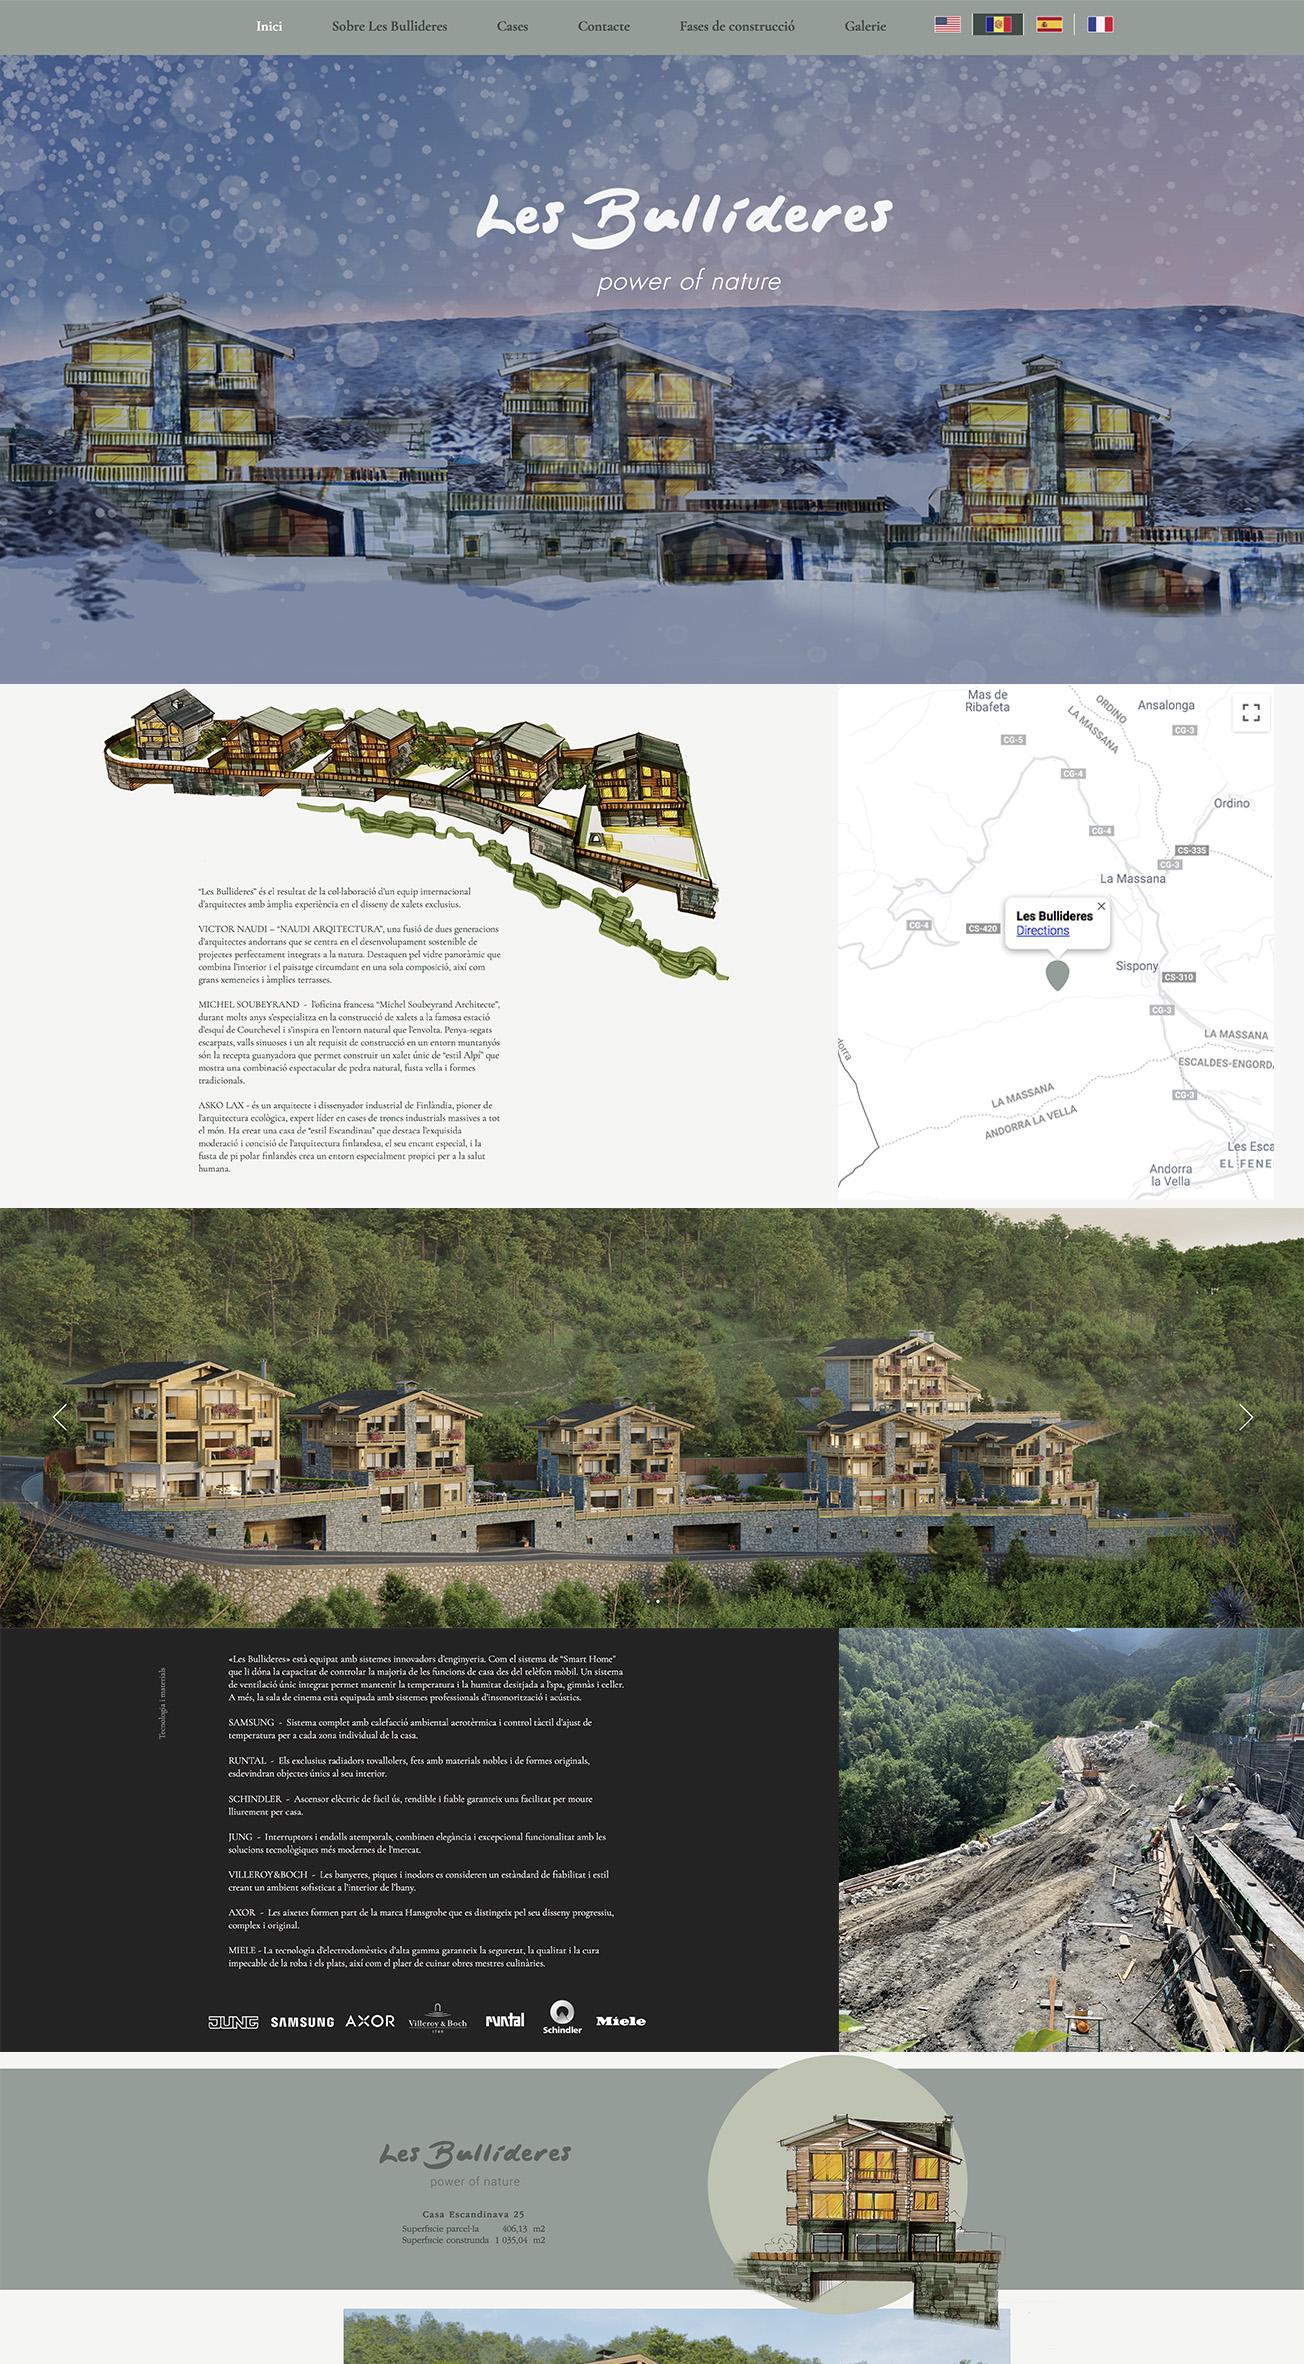 website design for developers and construction